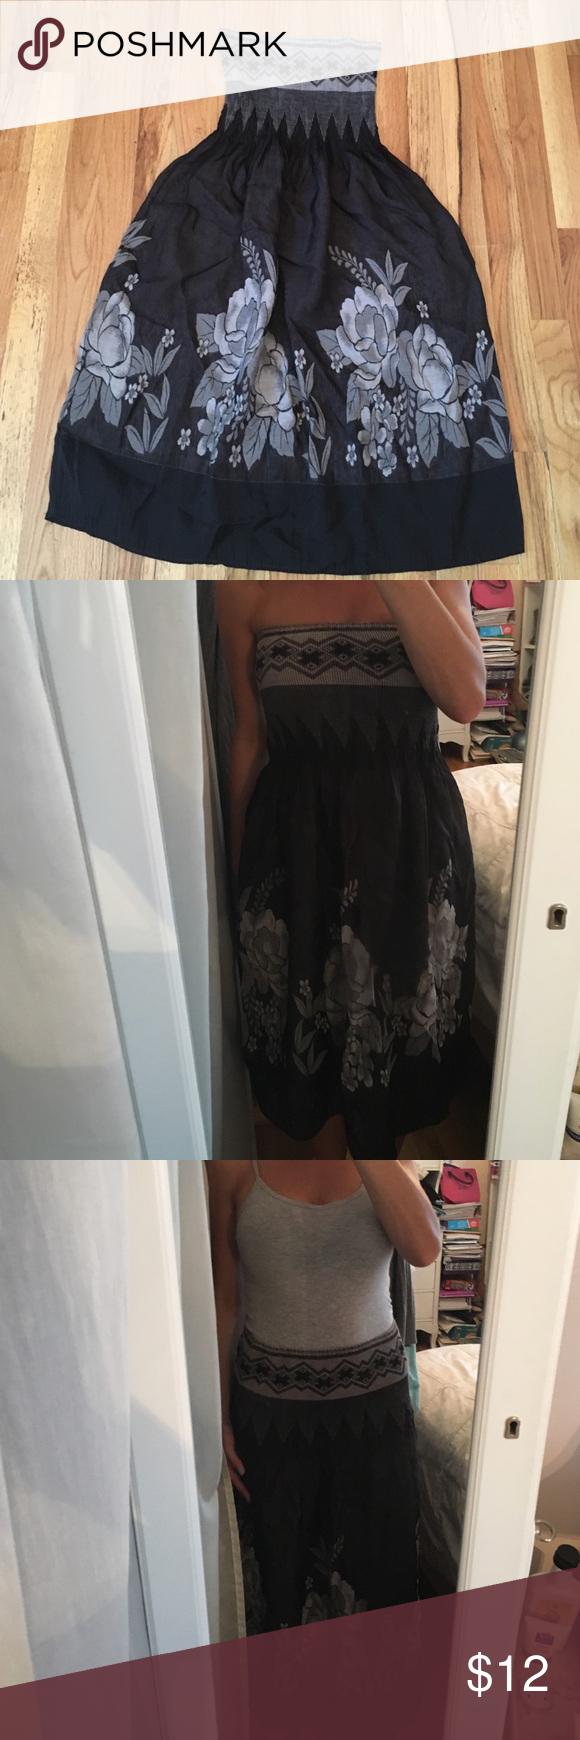 Strapless convertible dresslong skirt strapless dress